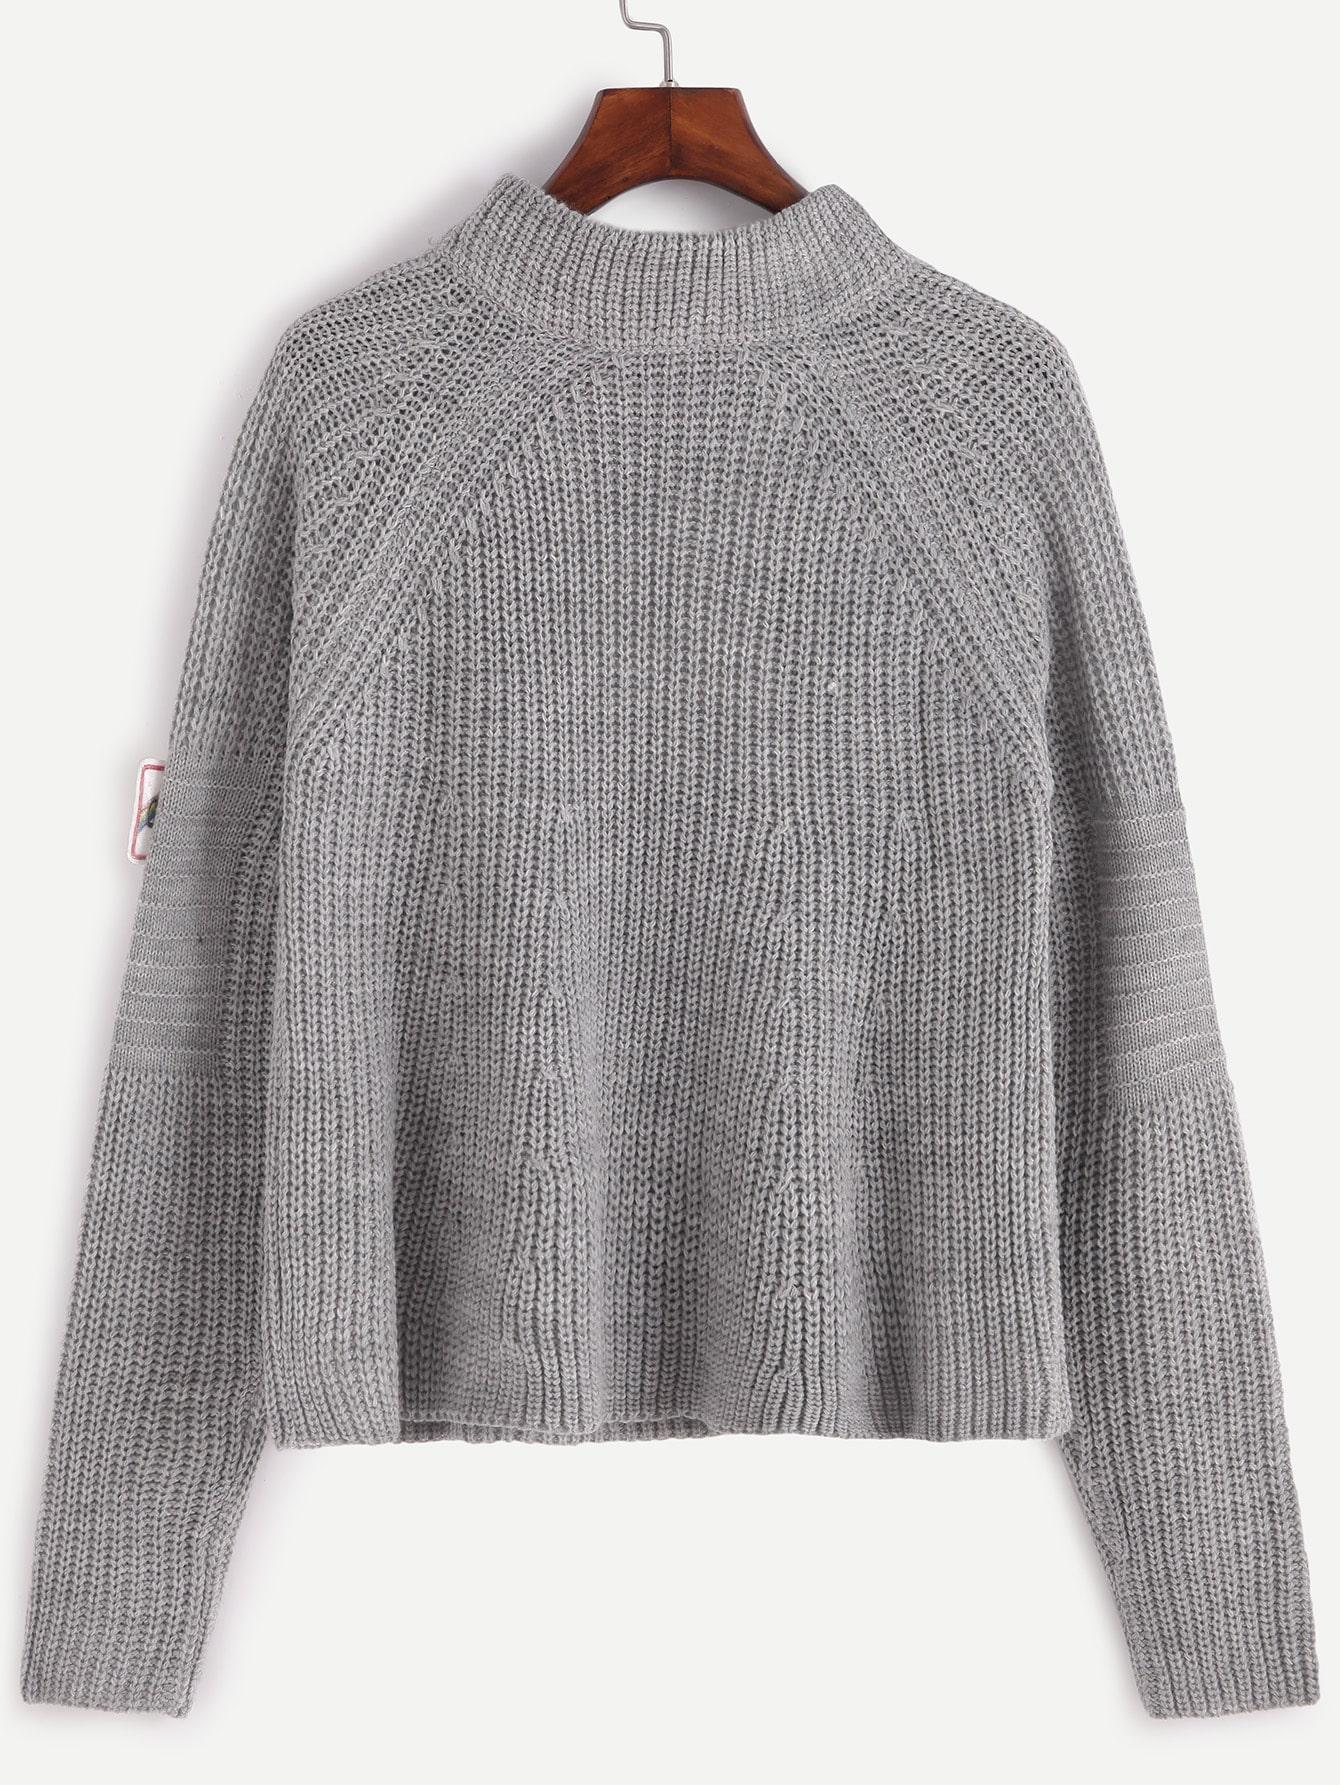 sweater161011457_2